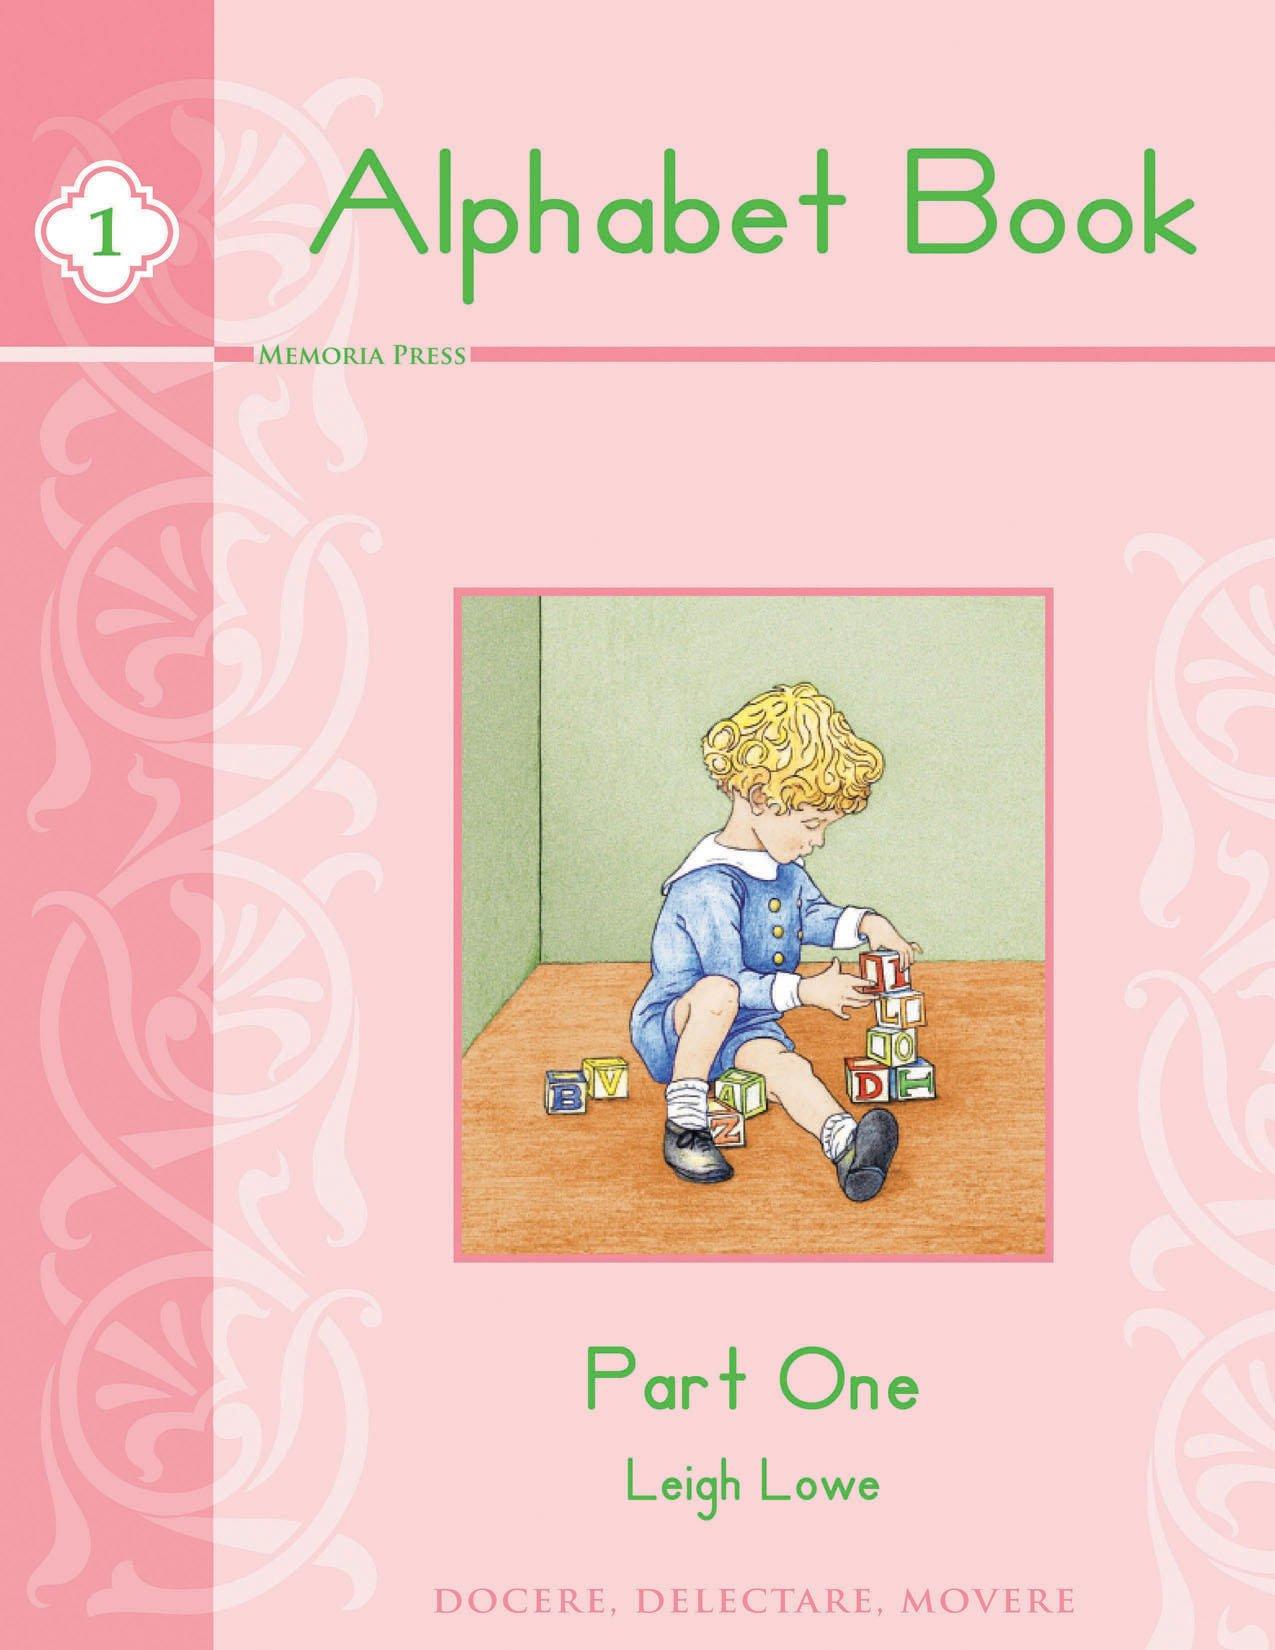 Alphabet Book, Part One: Leigh Lowe: 9781615381289: Amazon.com: Books